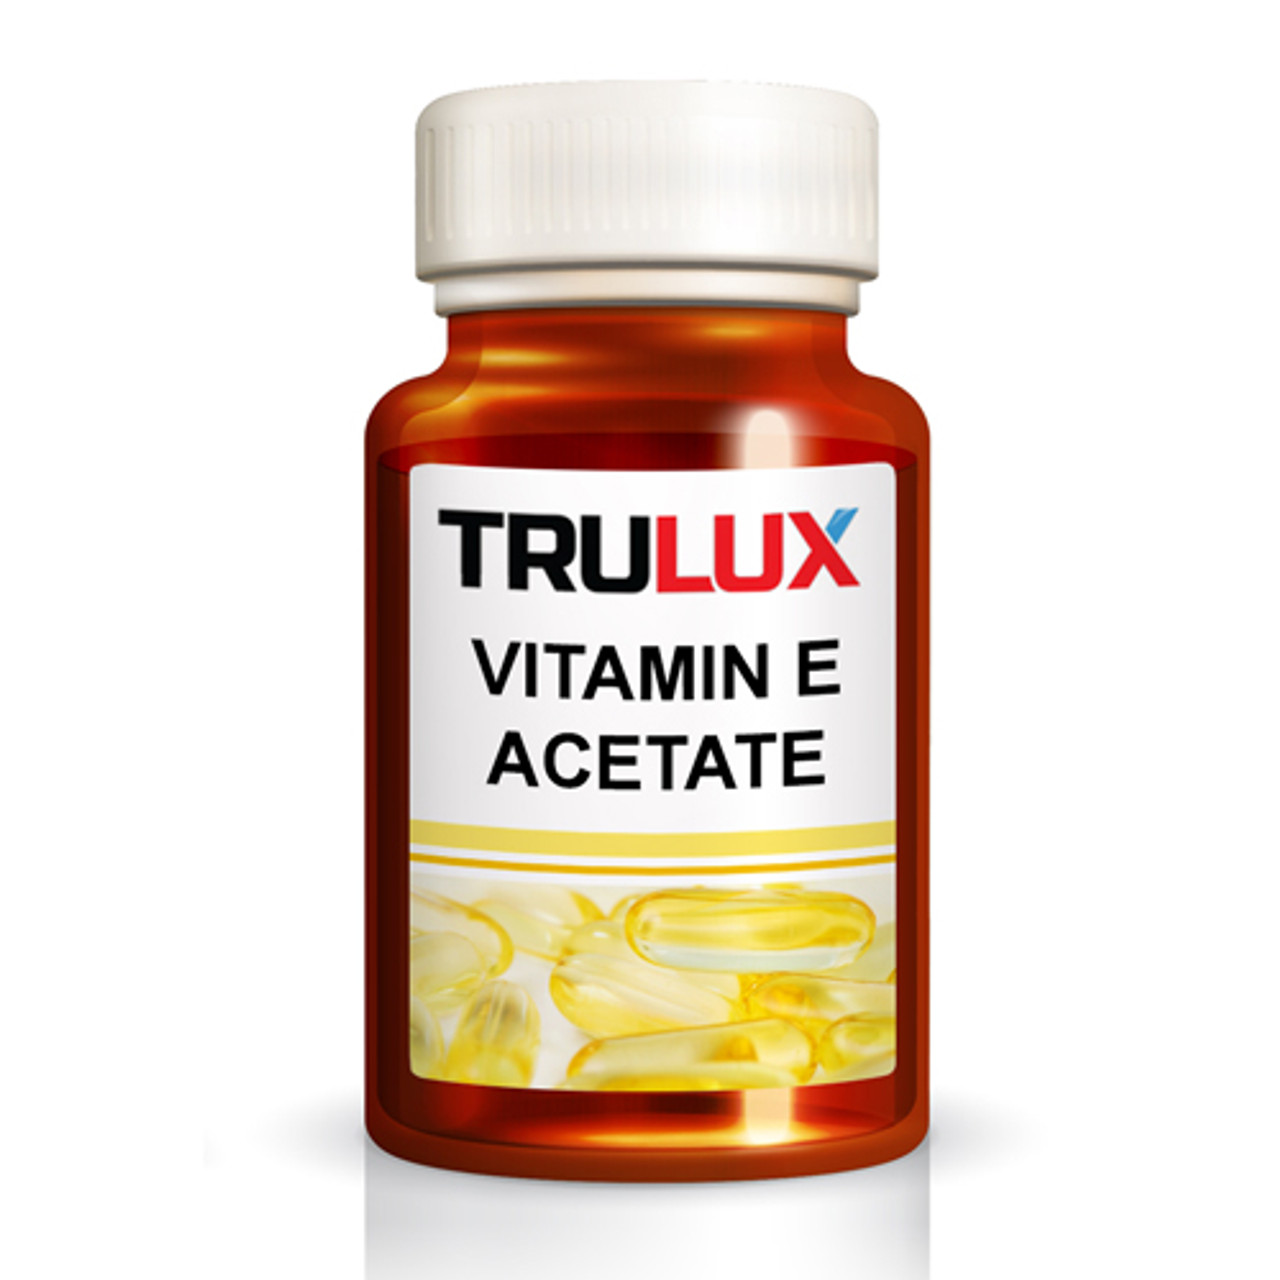 vitamin e acetate - photo #16